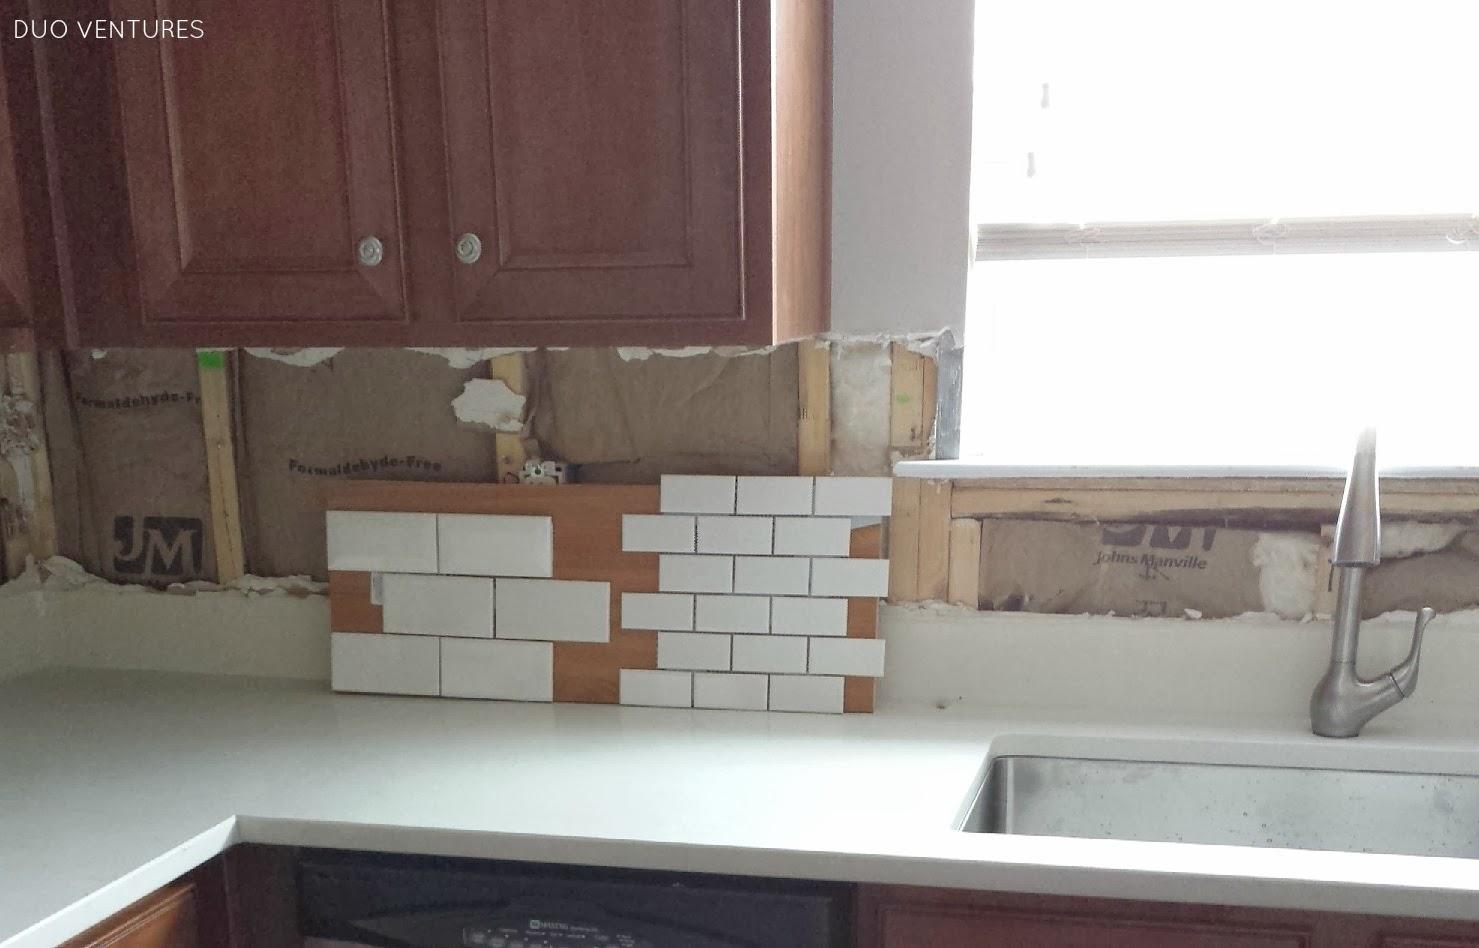 White Ceramic Subway Tile Backsplash: Duo Ventures: Kitchen Makeover: Subway Tile Backsplash